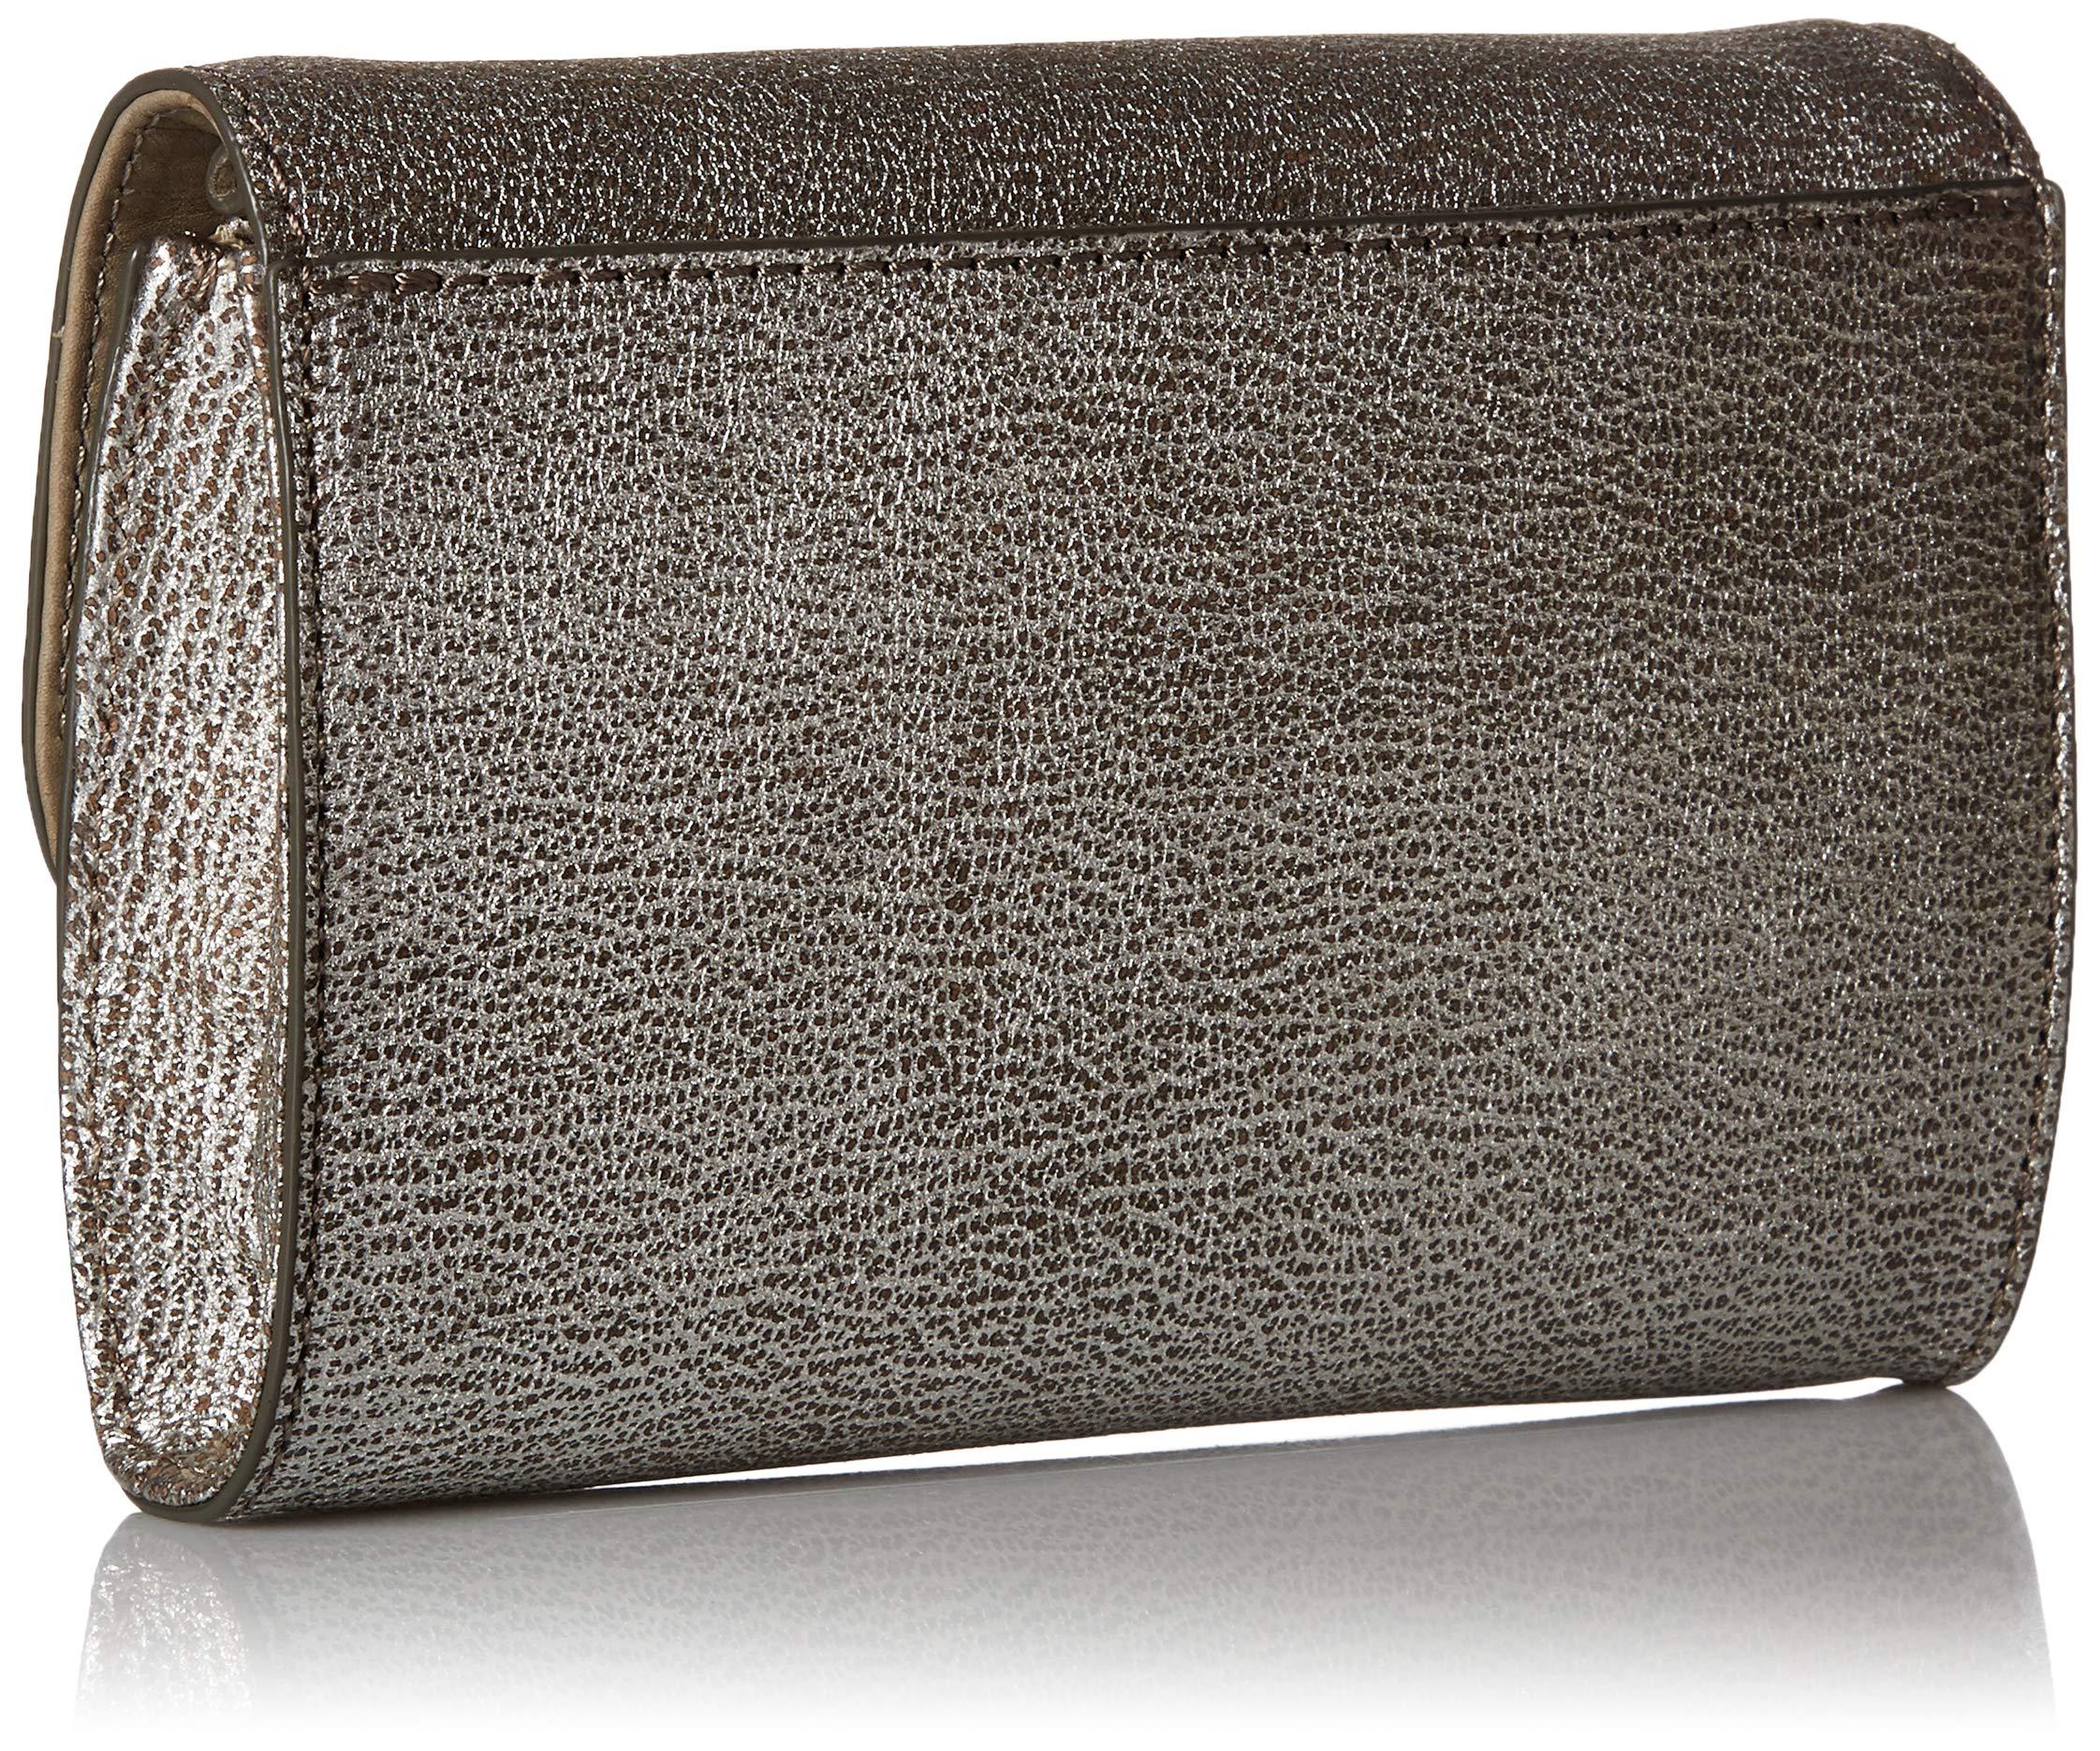 FRYE Melissa Wallet Crossbody Clutch Leather Bag, silver by FRYE (Image #2)